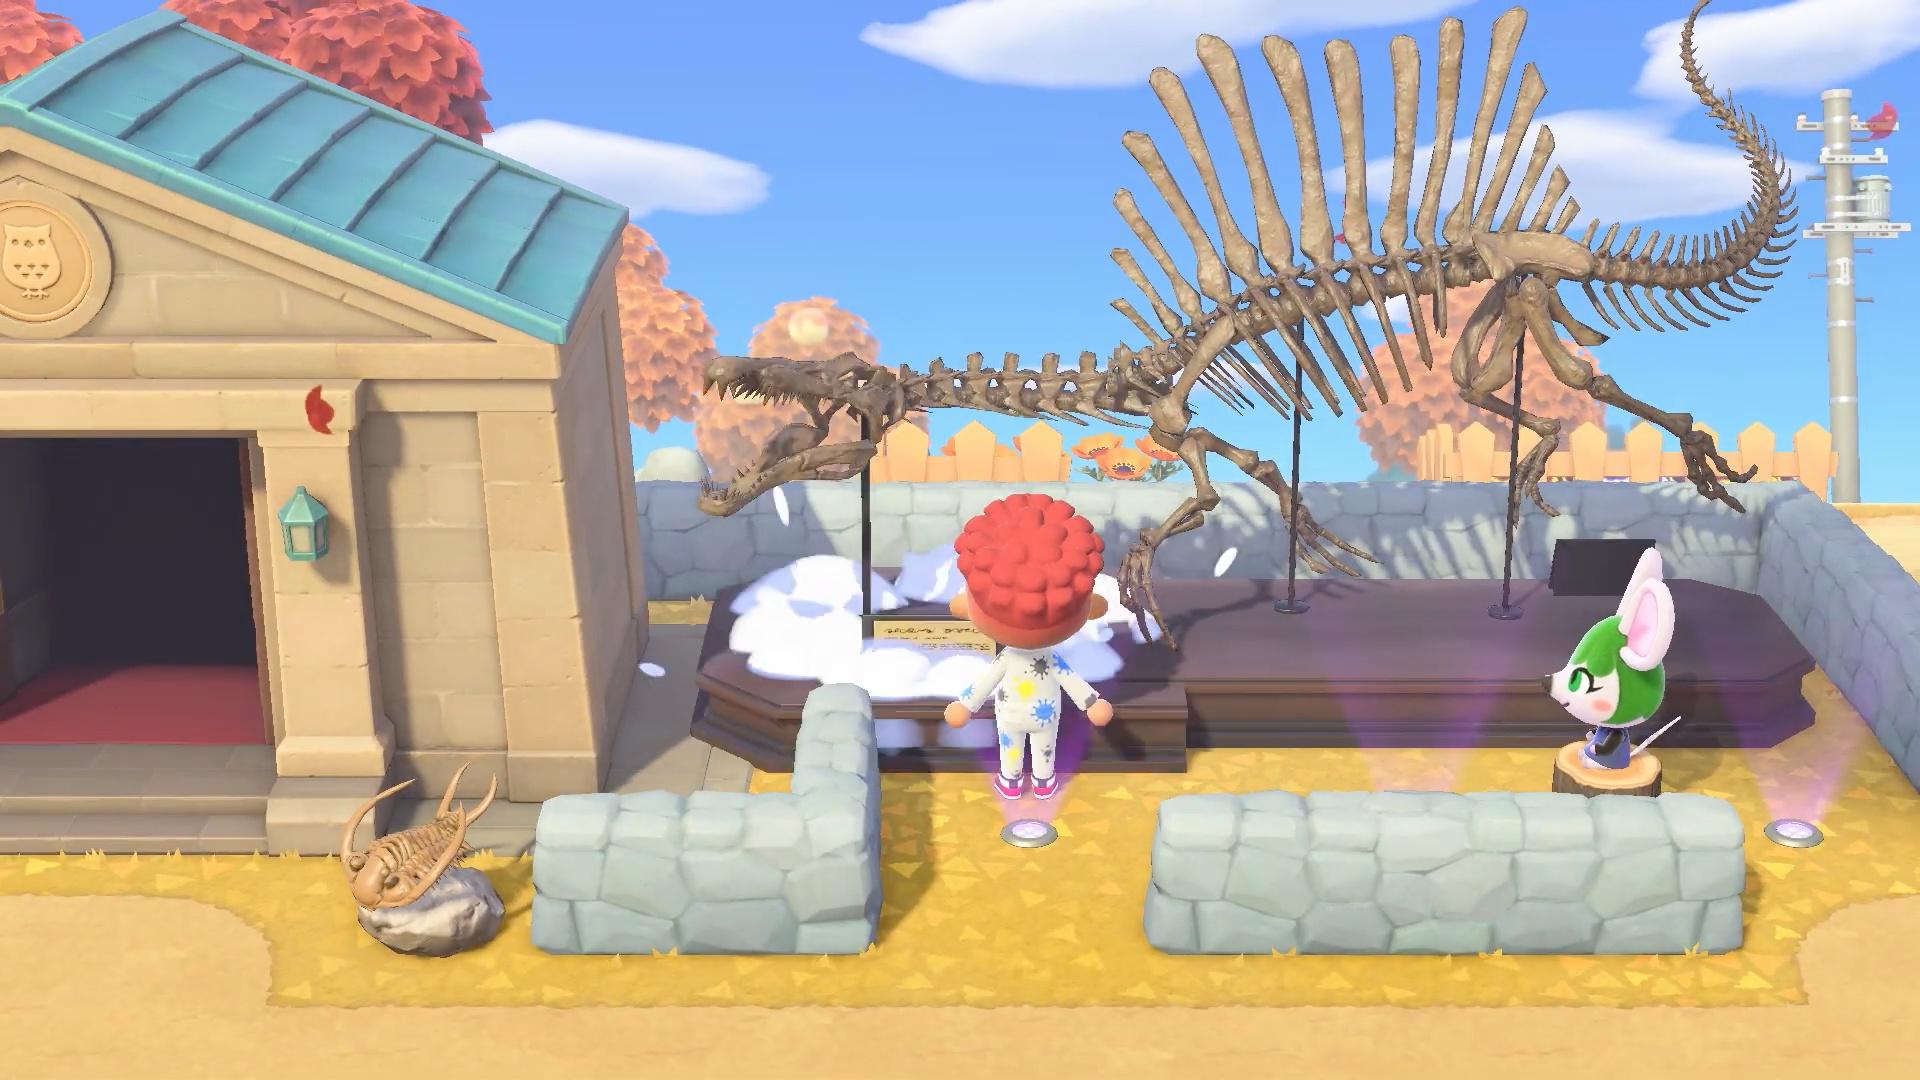 Gallery Take A Peek Inside Animal Crossing New Horizons